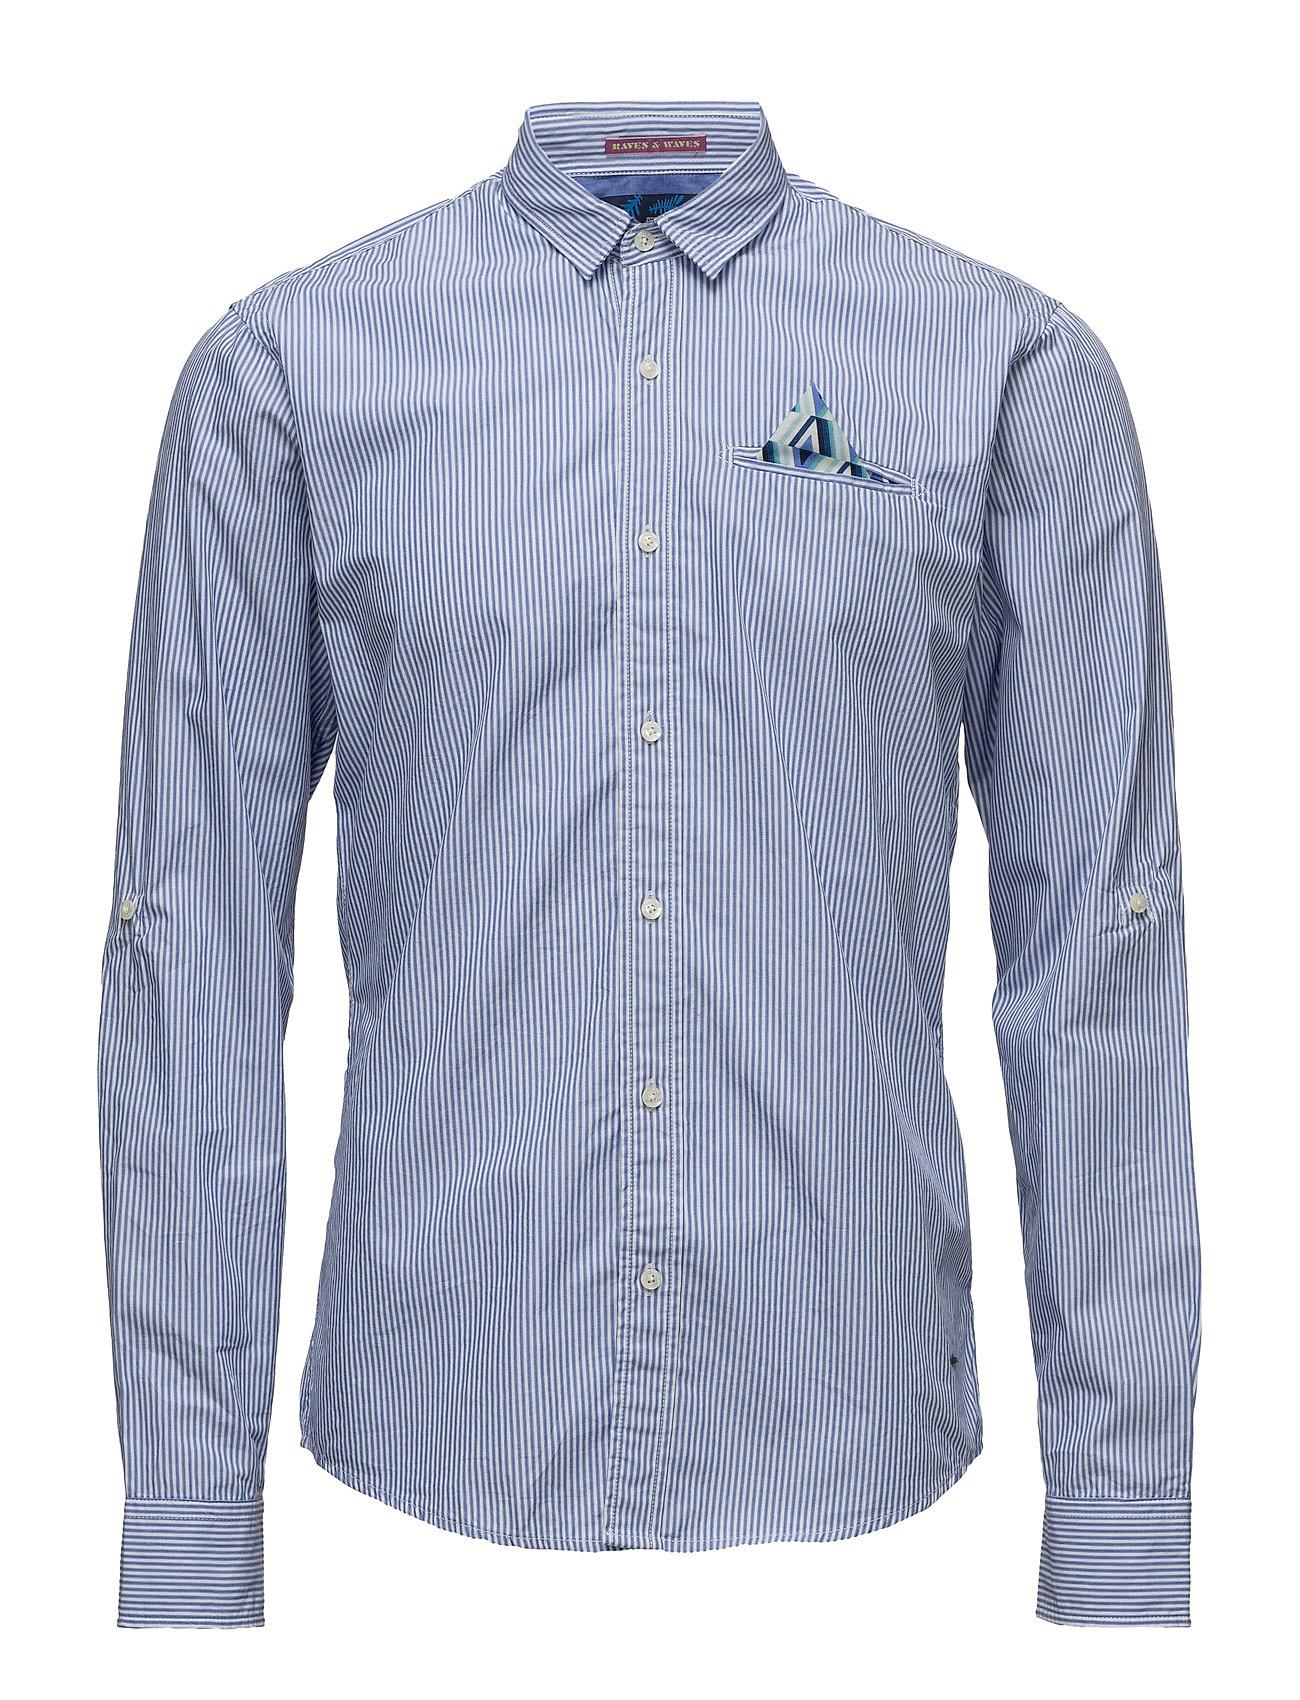 Classic Longsleeve Shirt With Fixed Multicolour Pochet Scotch & Soda Business til Herrer i